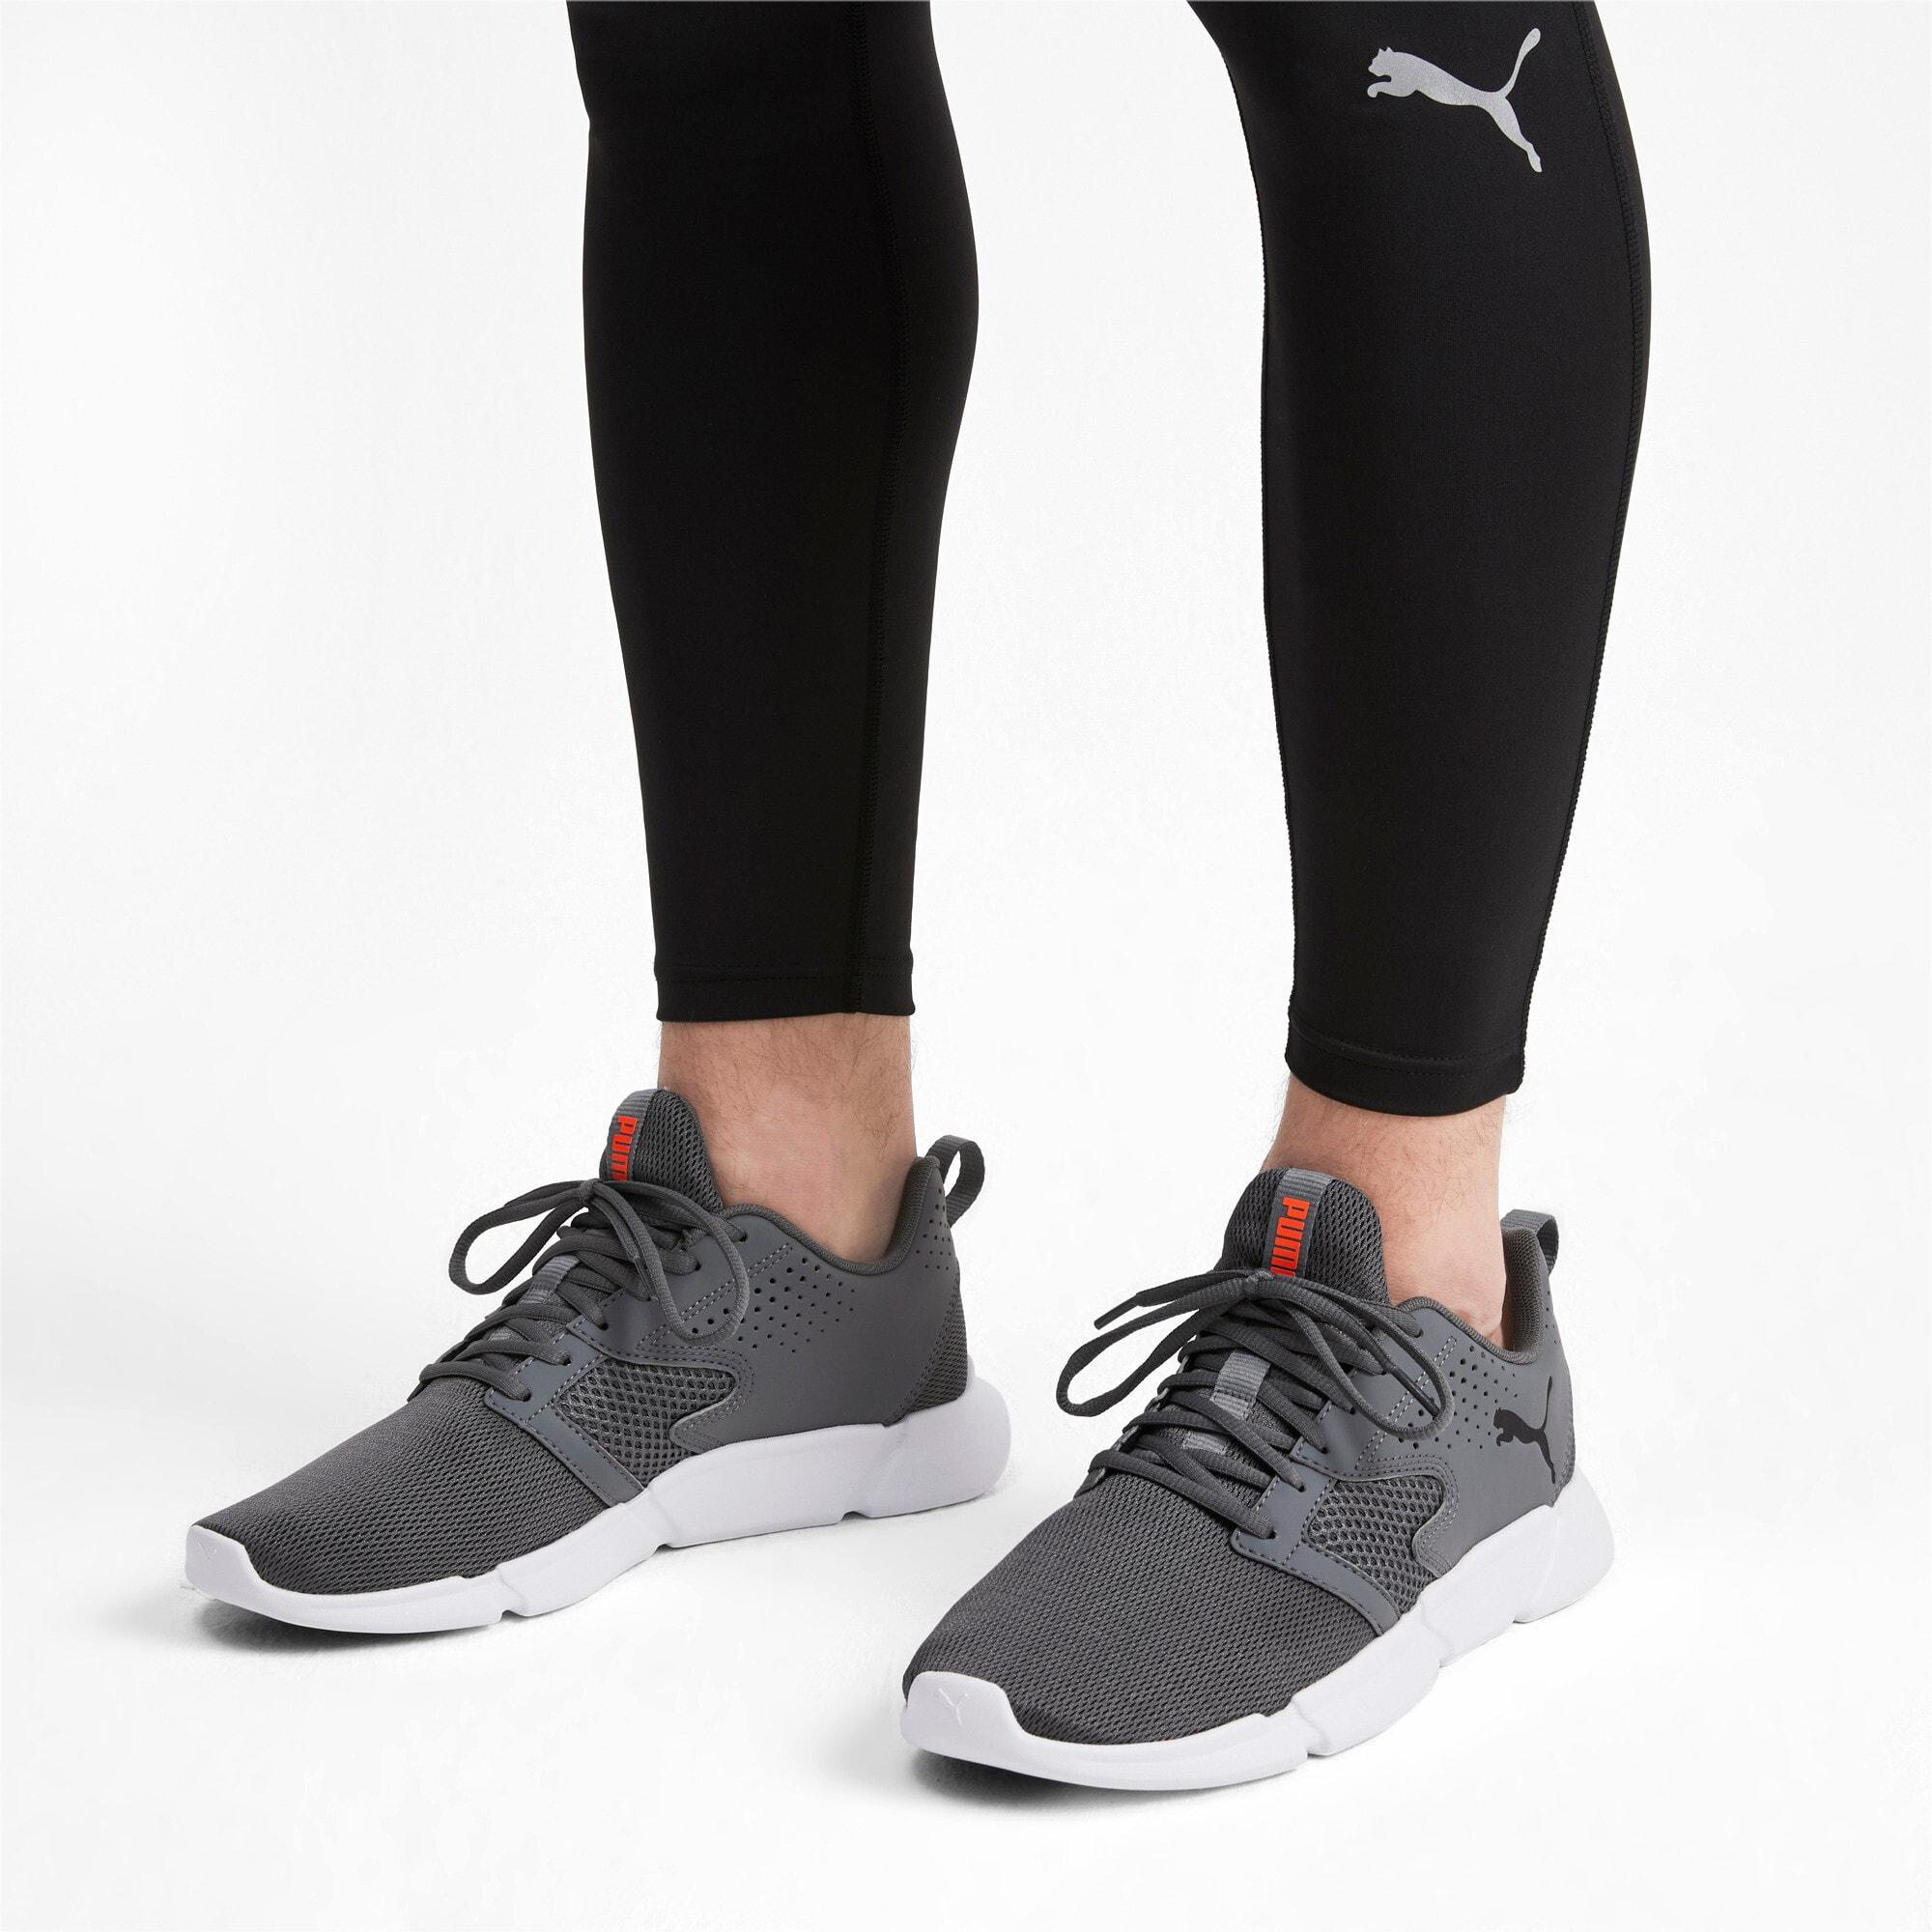 Thumbnail 3 of INTERFLEX Modern Sneakers, CASTLEROCK-Black-Nrgy Red, medium